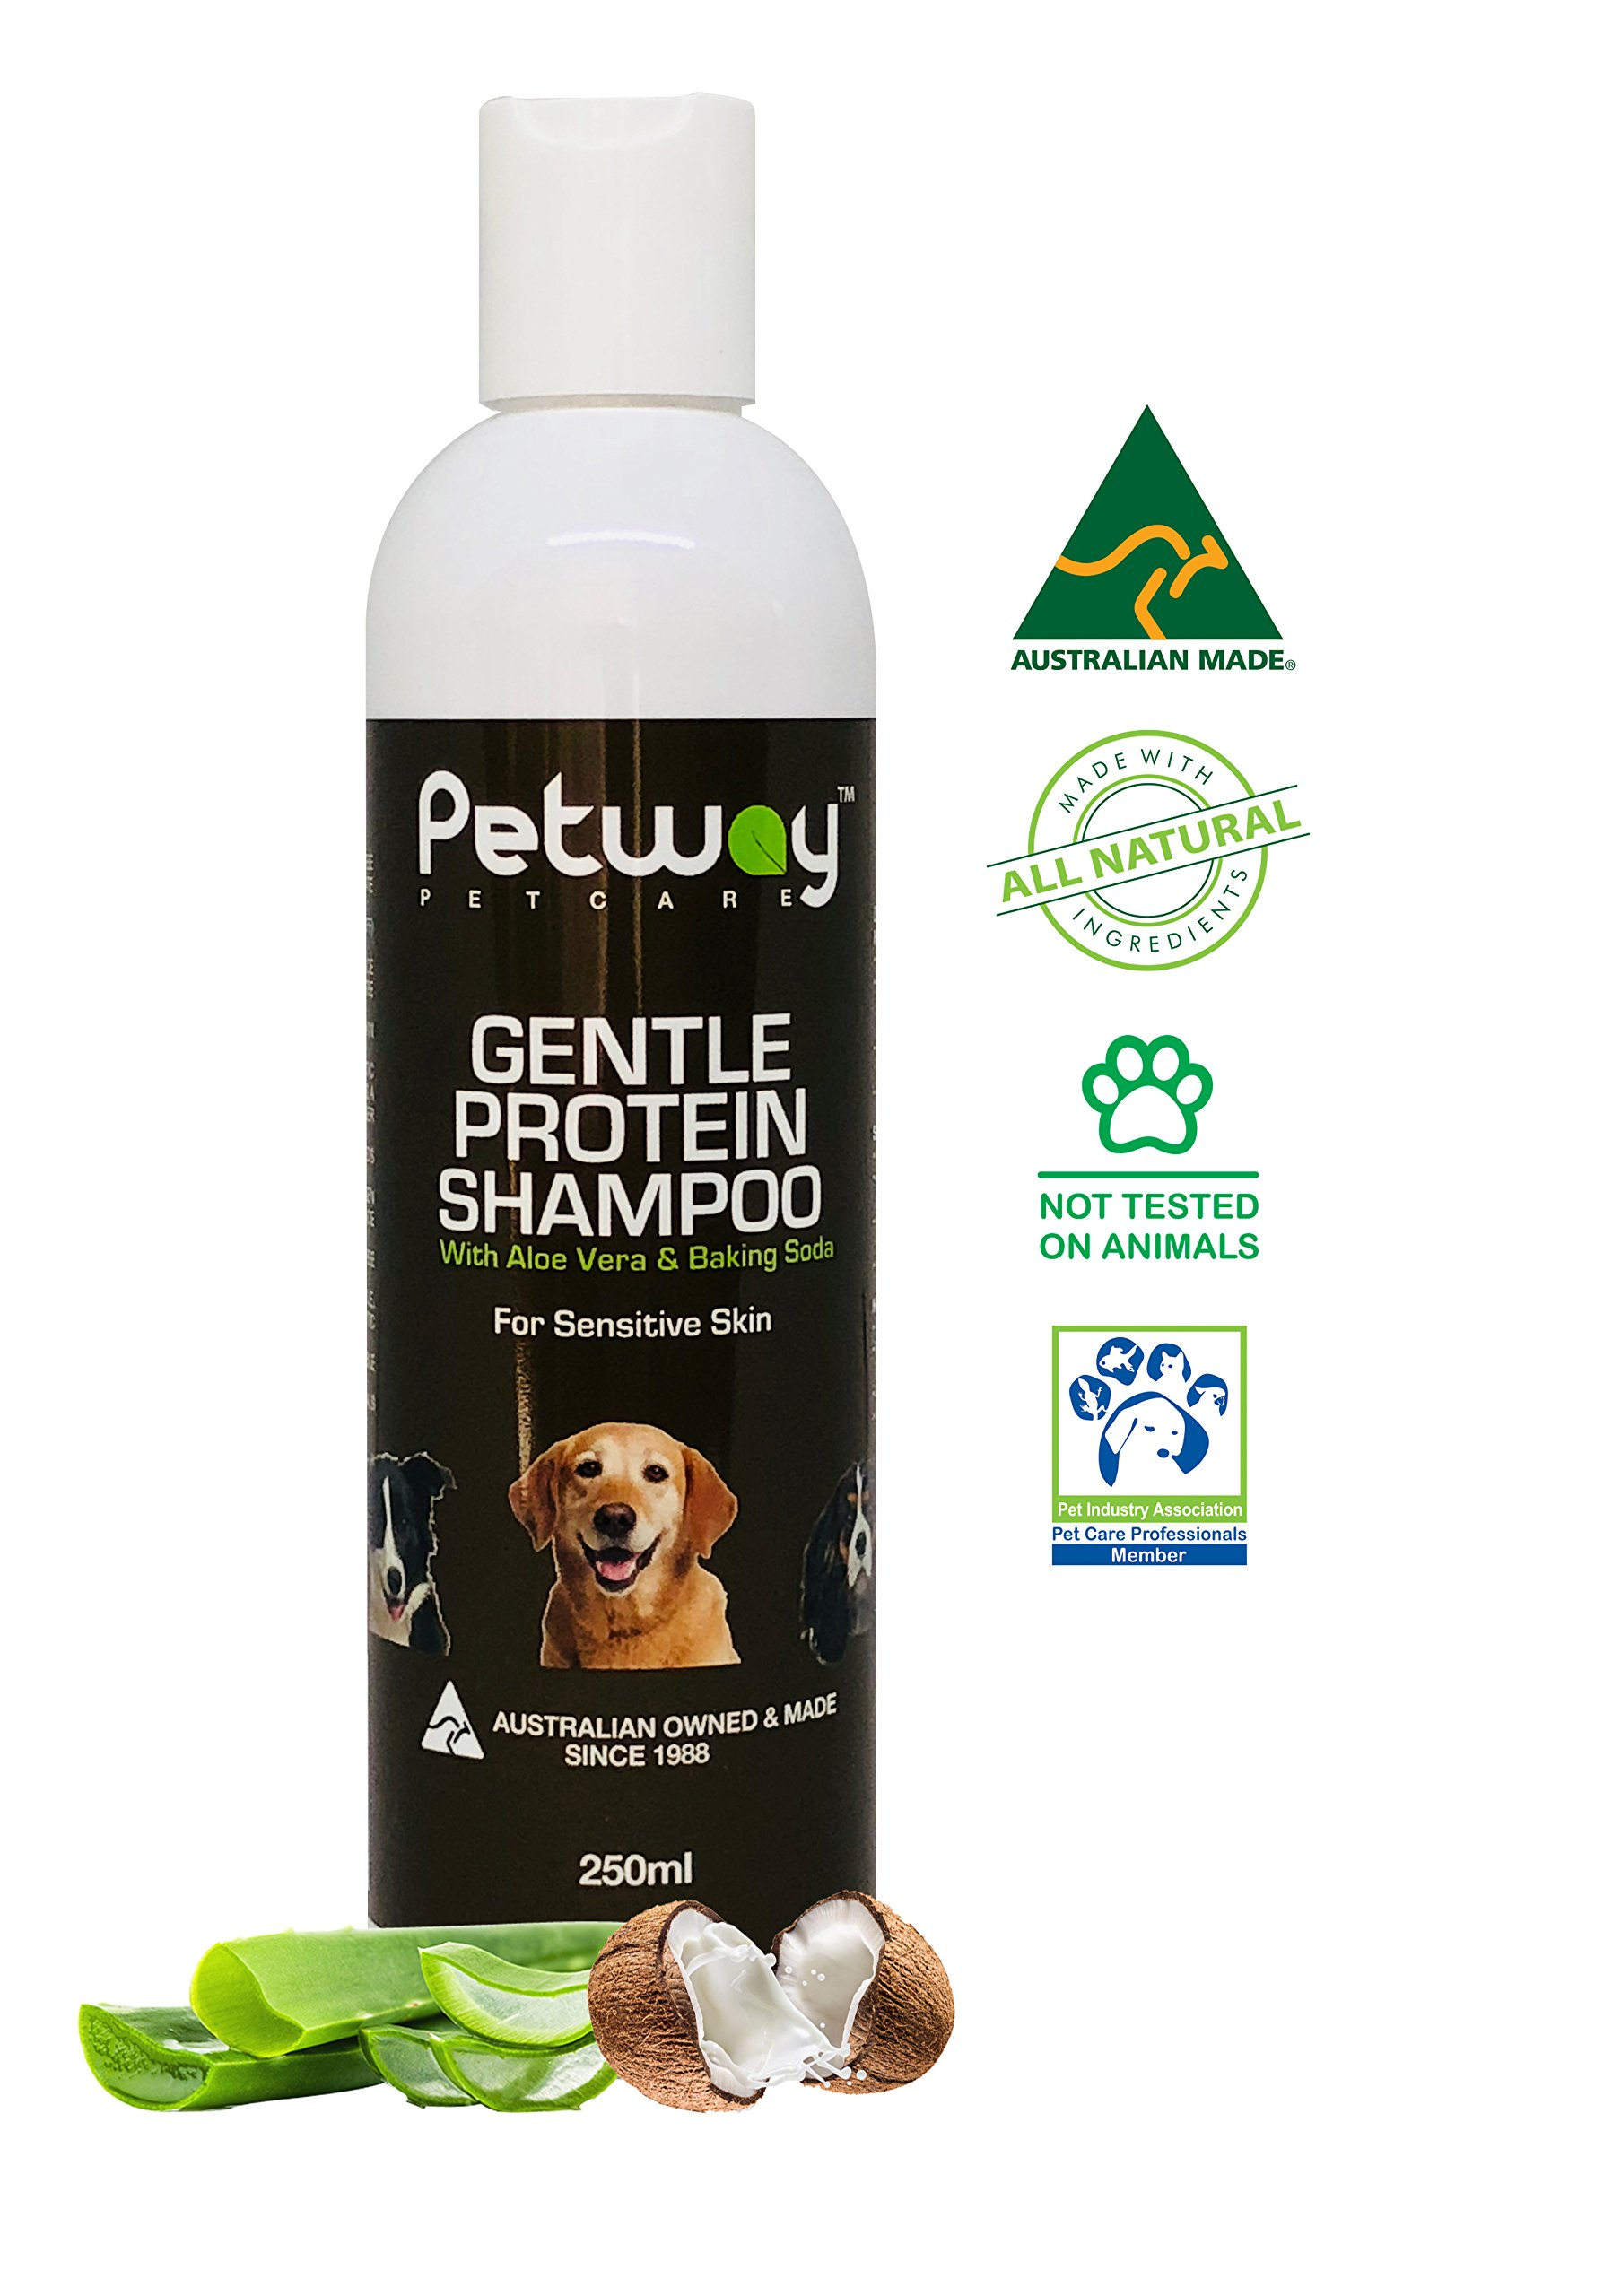 PETWAY - Dog Shampoo | Pet Protein Shampoo with Aloe Vera & Baking Soda, Coconut Fragrance, Pet Odor Eliminator Deodorizer, Best for Sensitive Skin, Removes Dandruff, Biodegradable - 250ml